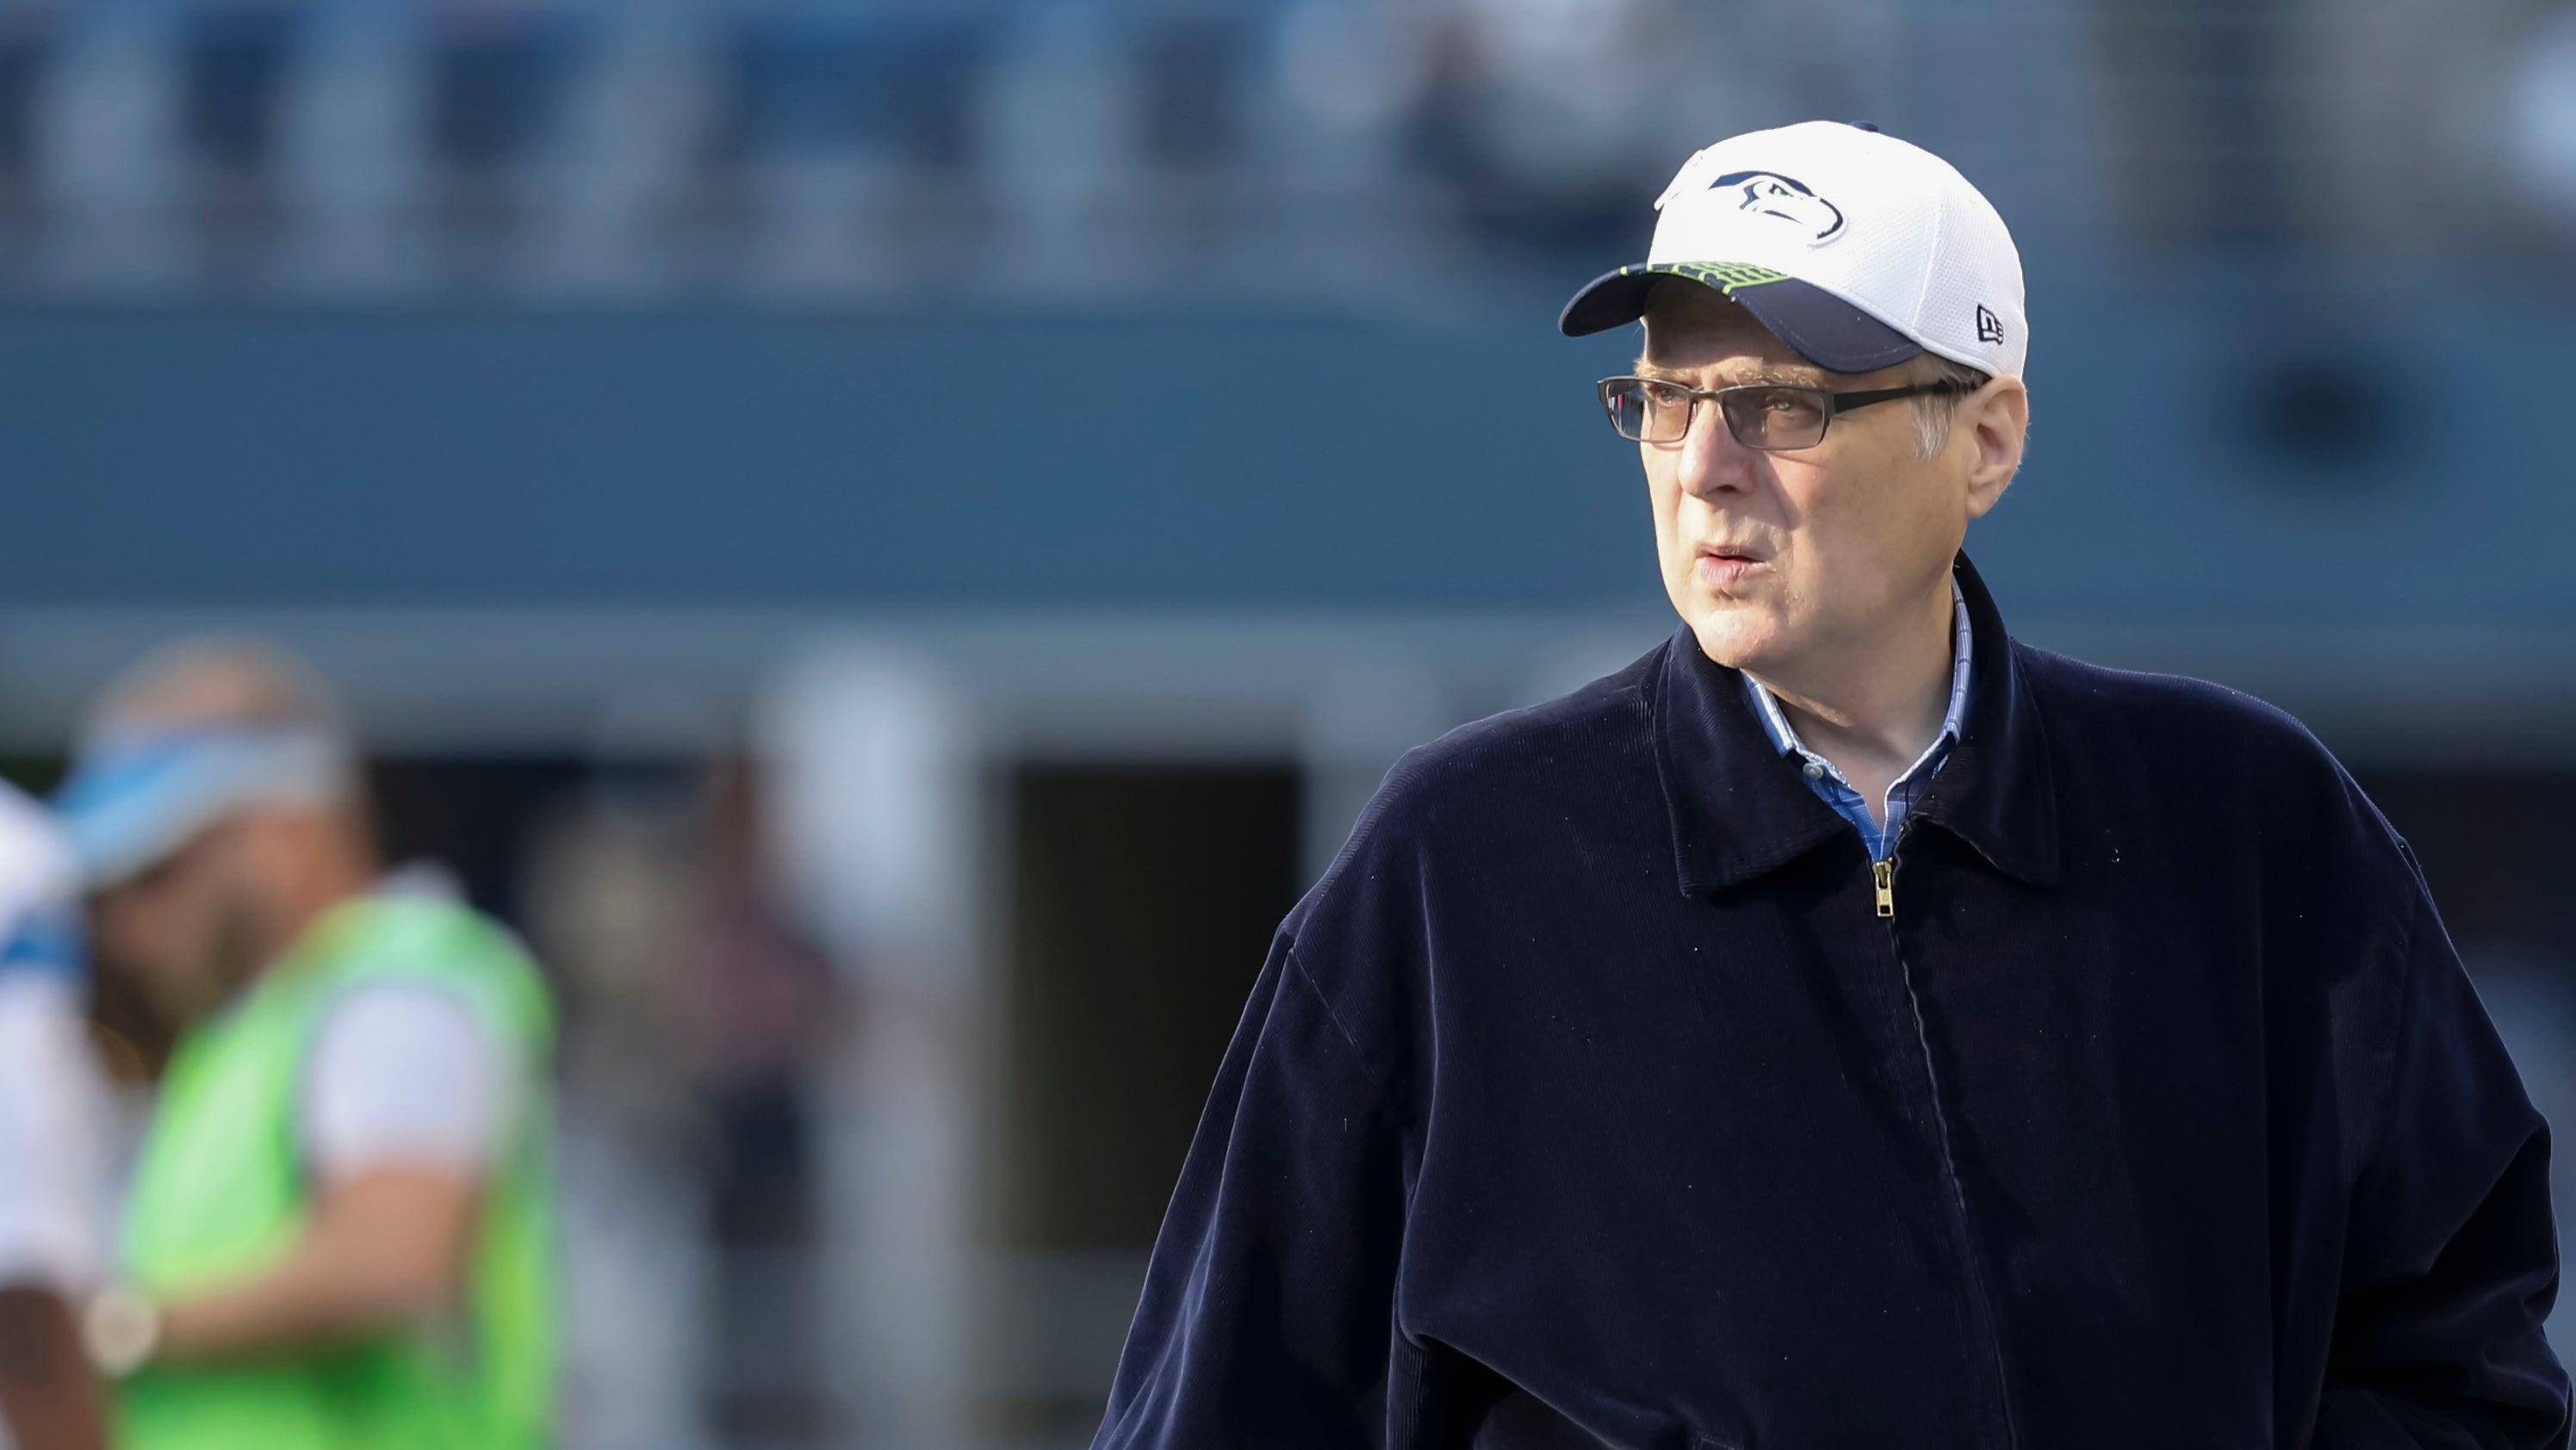 Paul Allen, Microsoft Co-Founder, Dead At 65